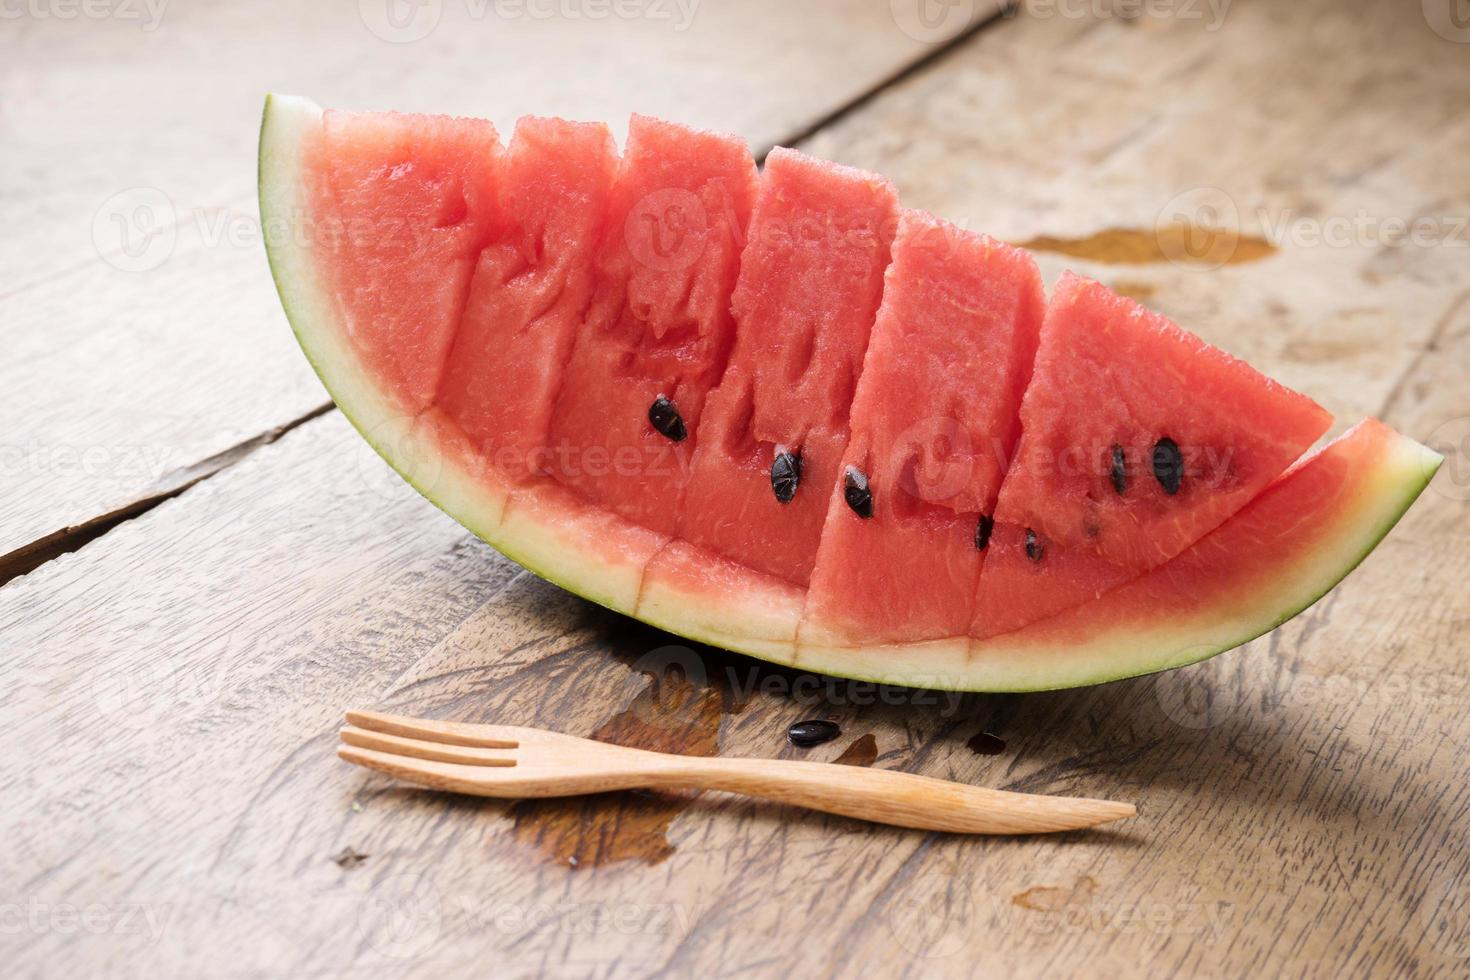 Slices of fresh watermelon photo